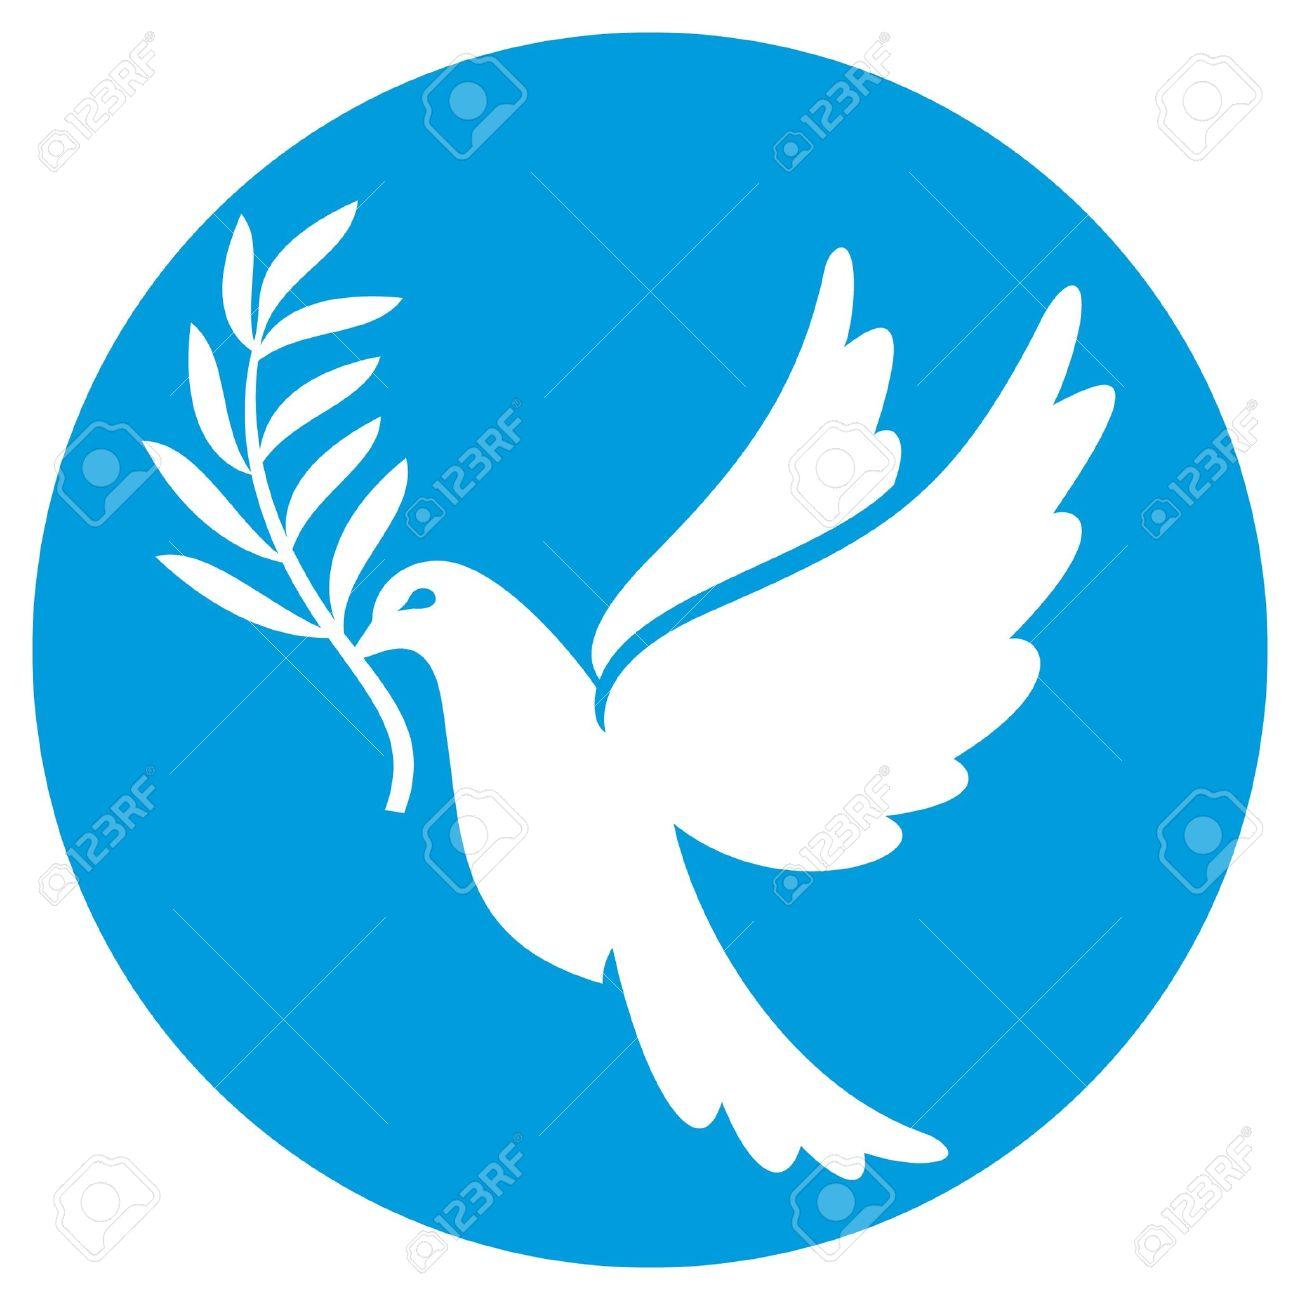 dove of peace (peace dove, symbol of peace) - 15840793